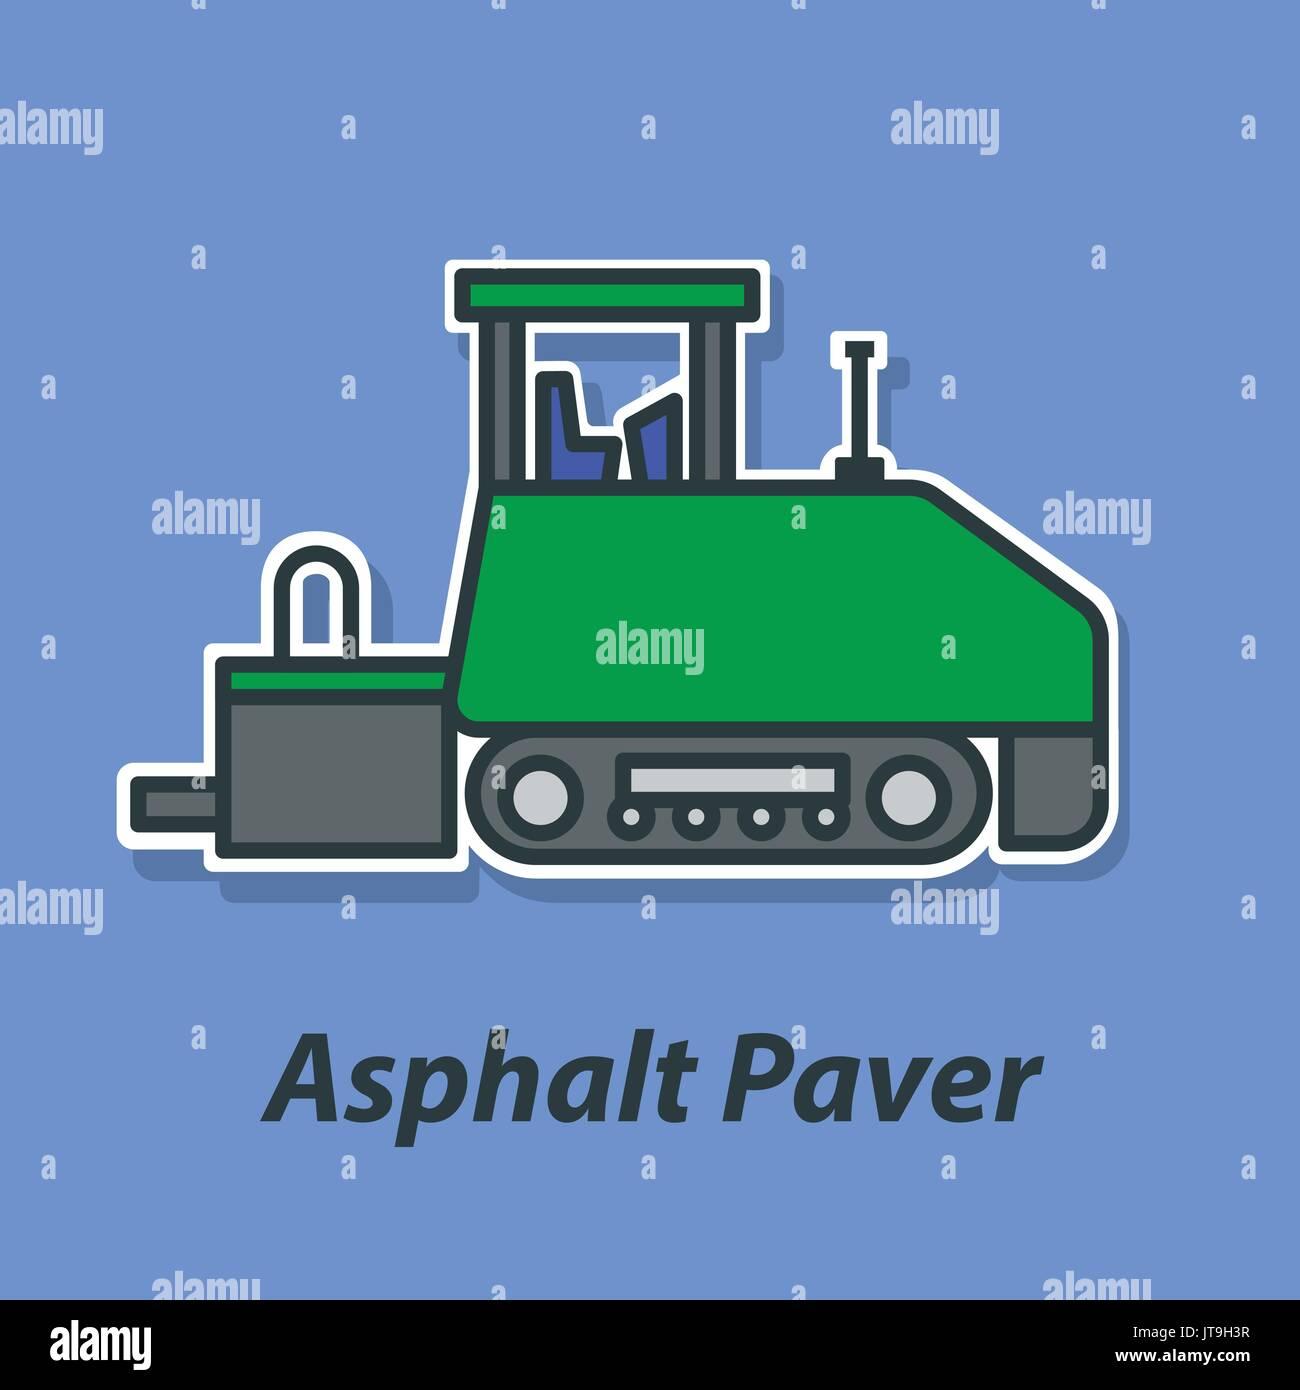 Asphalt Paver Stock Photos Amp Asphalt Paver Stock Images